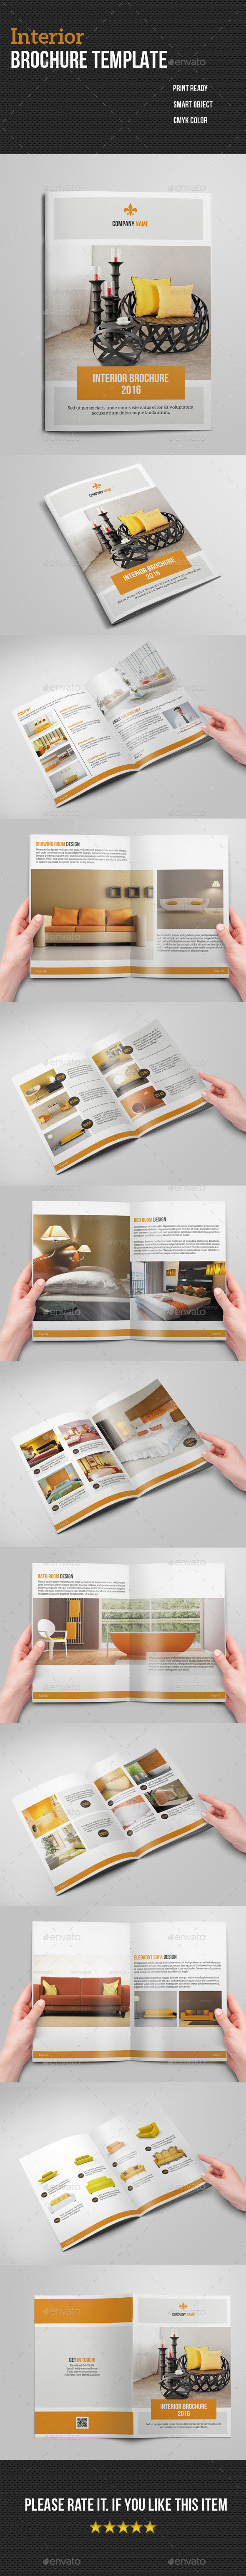 Interior Brochure/ Catalog/ Portfolio - Corporate Brochures